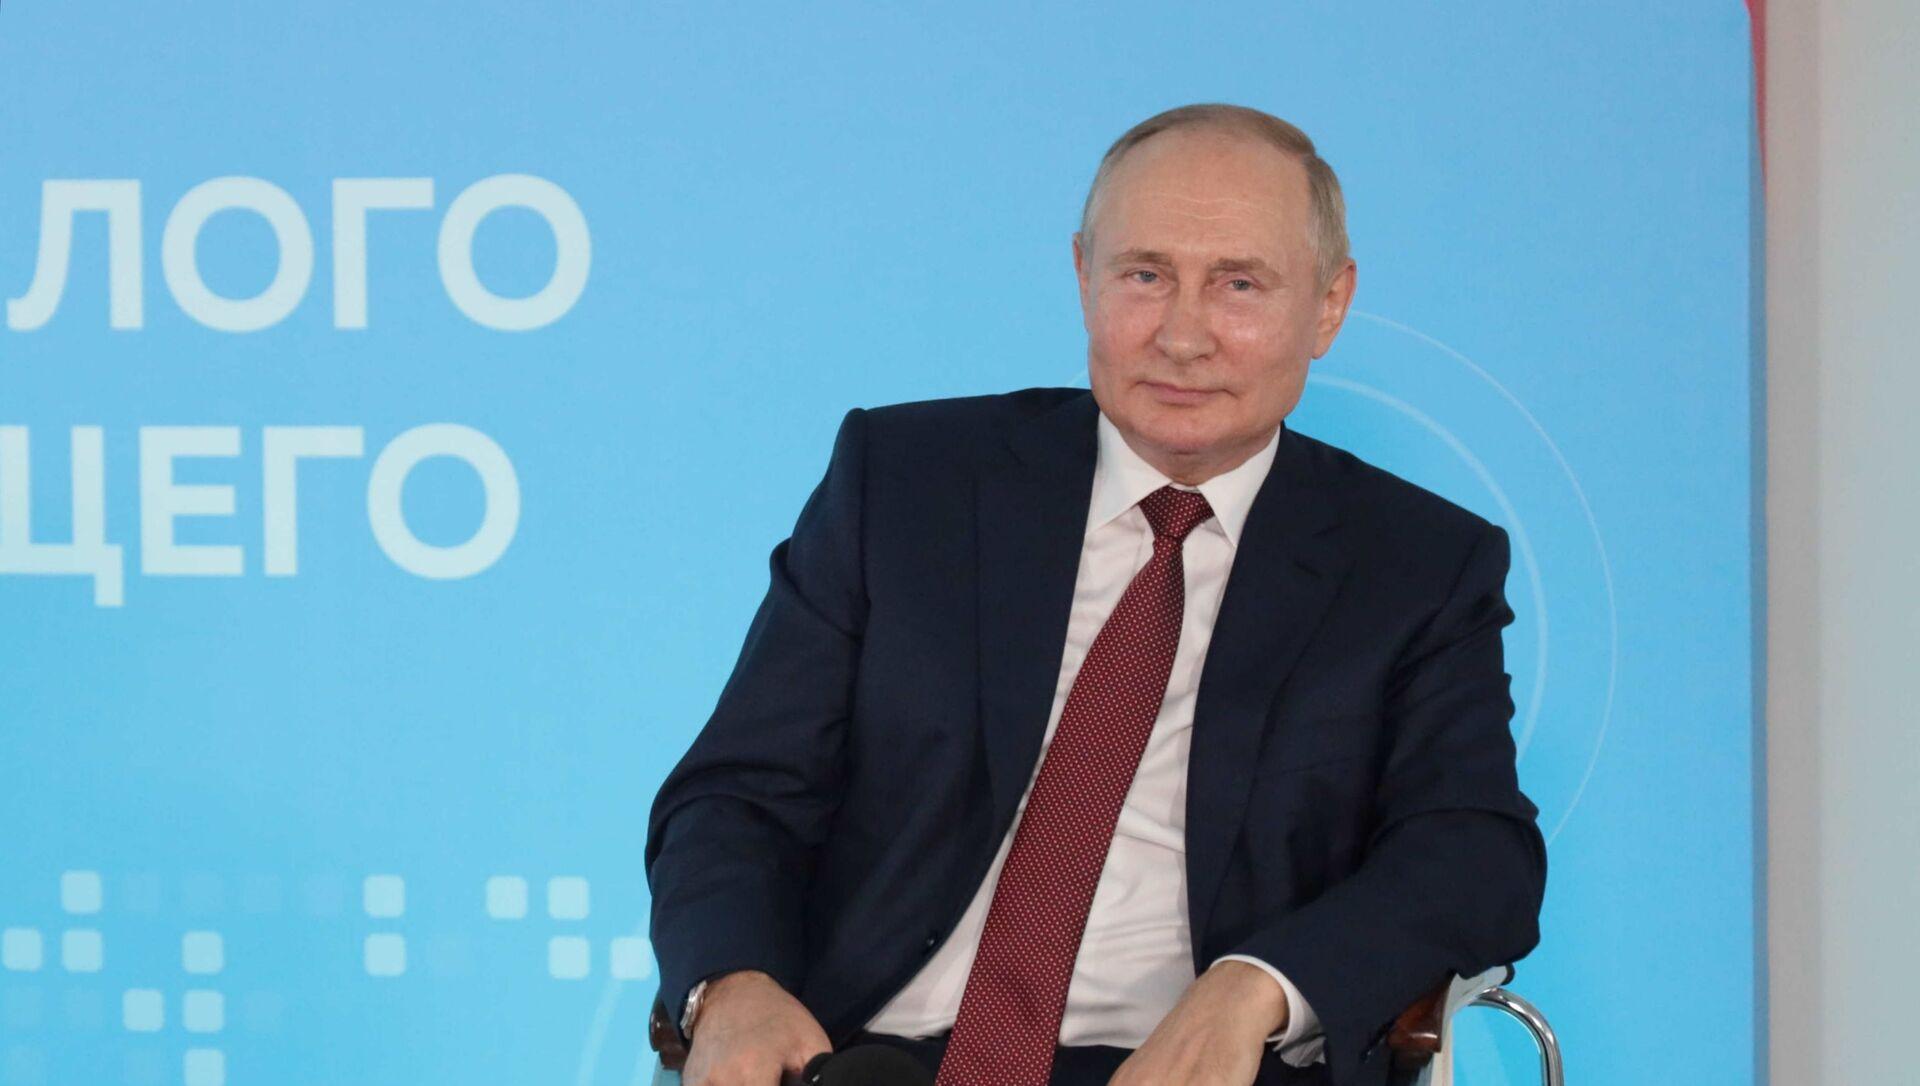 Президент РФ В. Путин провел встречу со школьниками - Sputnik Азербайджан, 1920, 01.09.2021